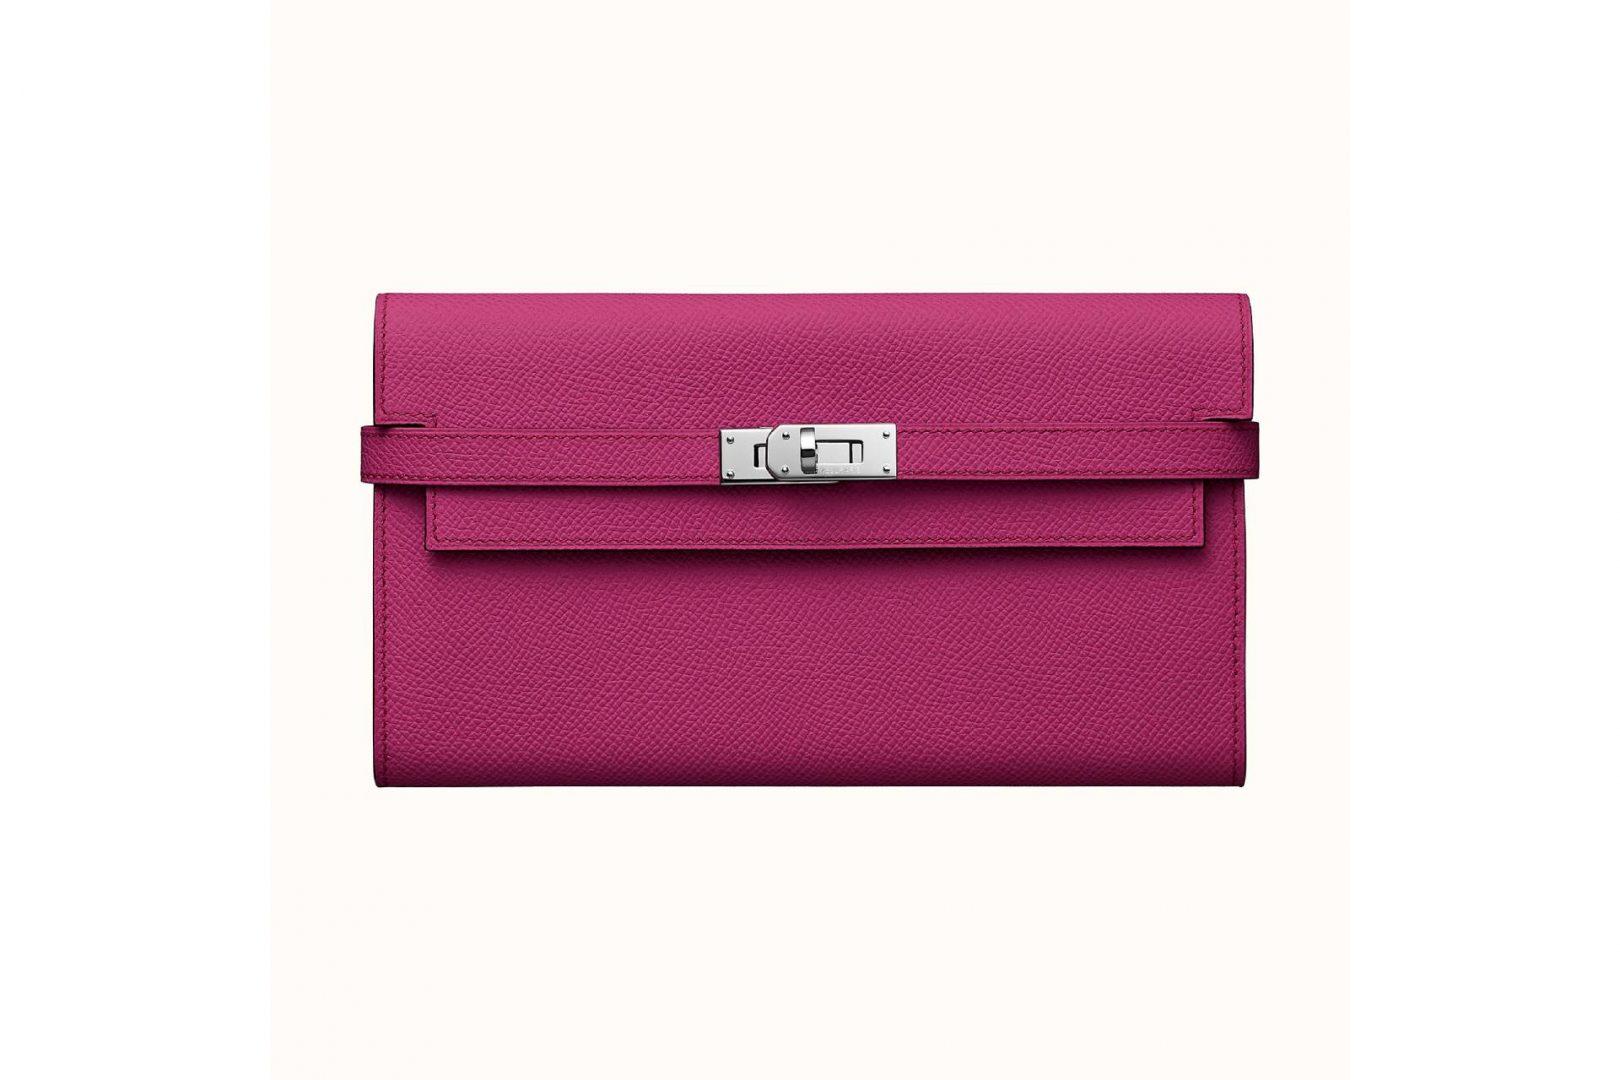 Hermès Kelly Classic wallet, Rose Pourpre.